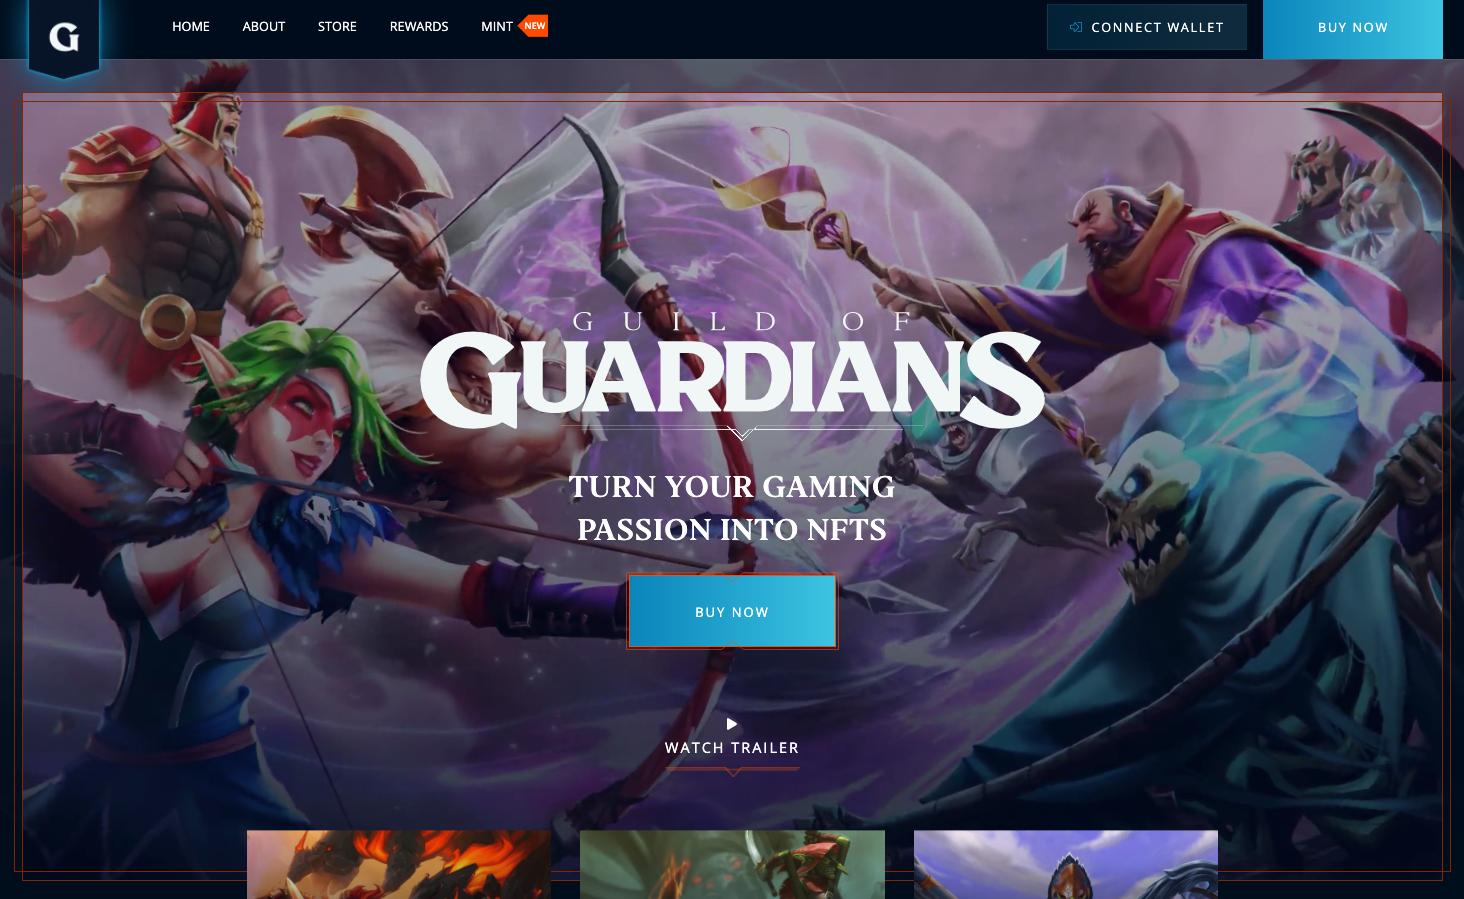 Best upcoming NFT games - Guild of Guardians